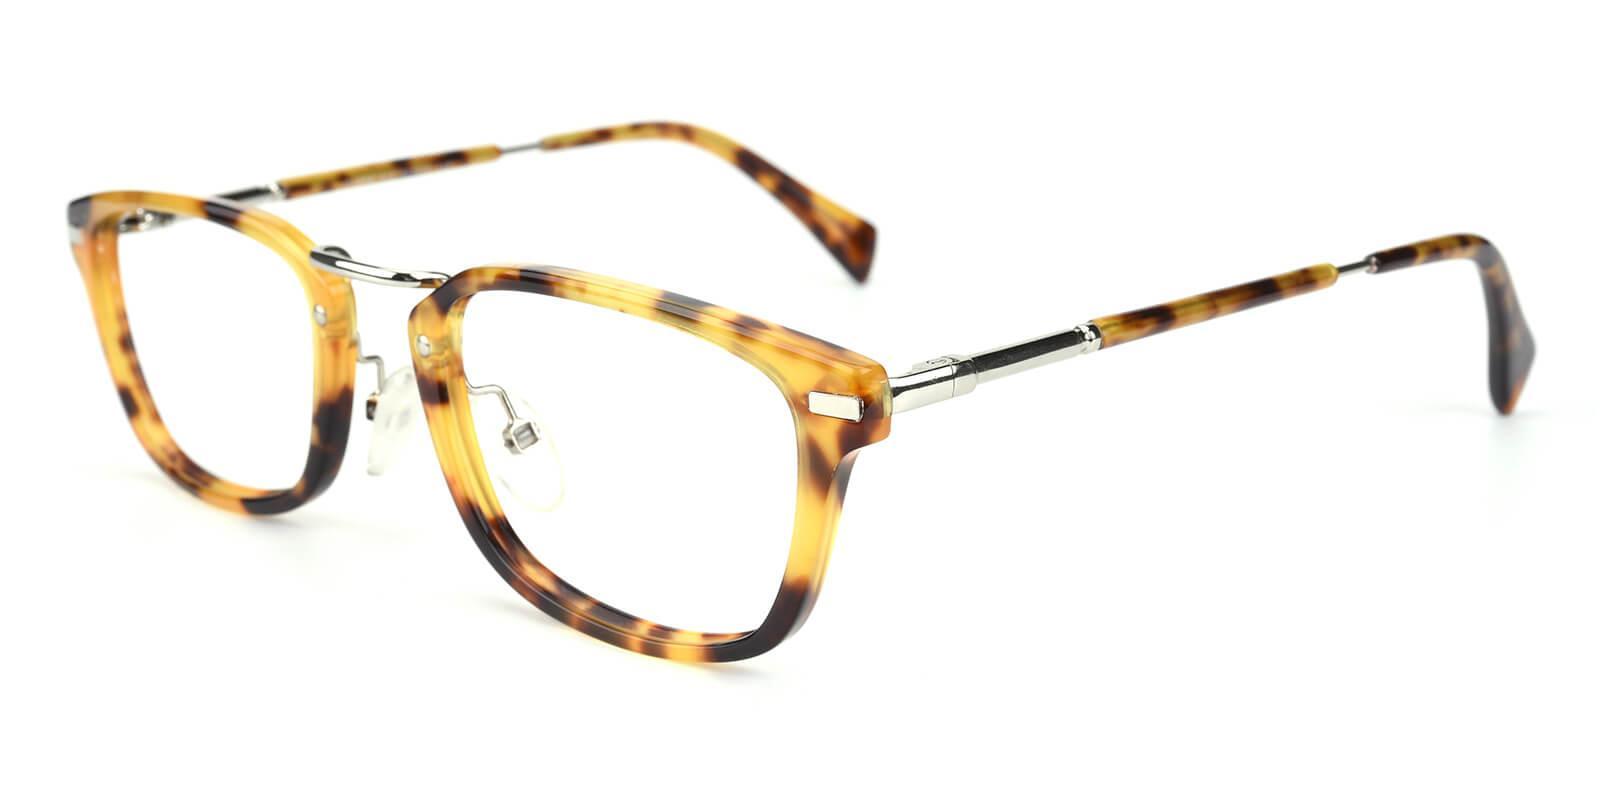 Madatte-Tortoise-Rectangle-Acetate / Metal-Eyeglasses-additional1